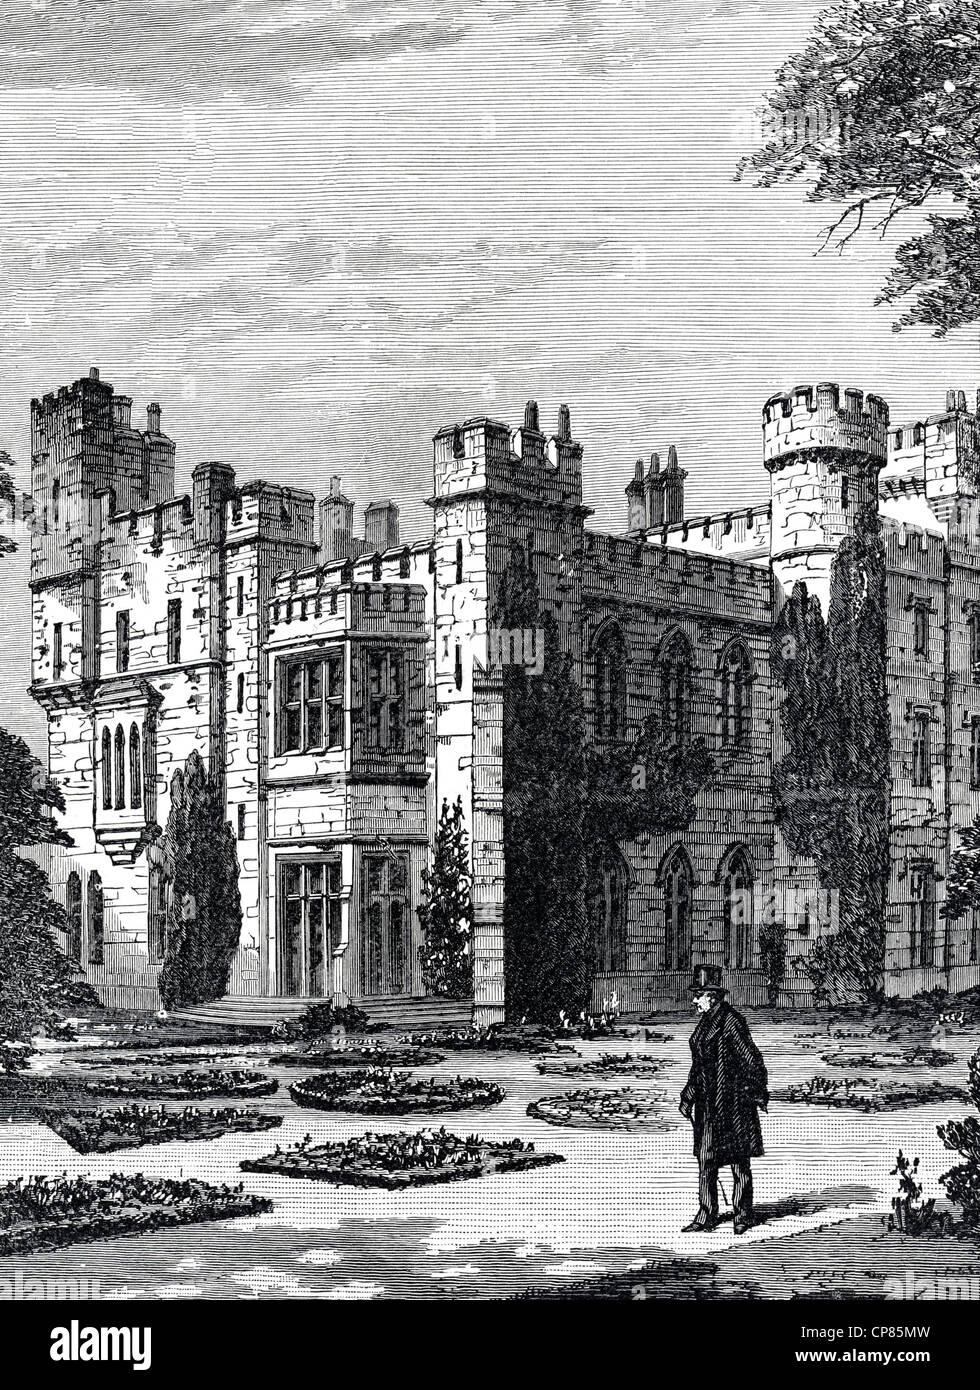 New Hawarden Castle, Hawarden, Flintshire, Wales, England, the estate of former British Prime Minister William Ewart Stock Photo